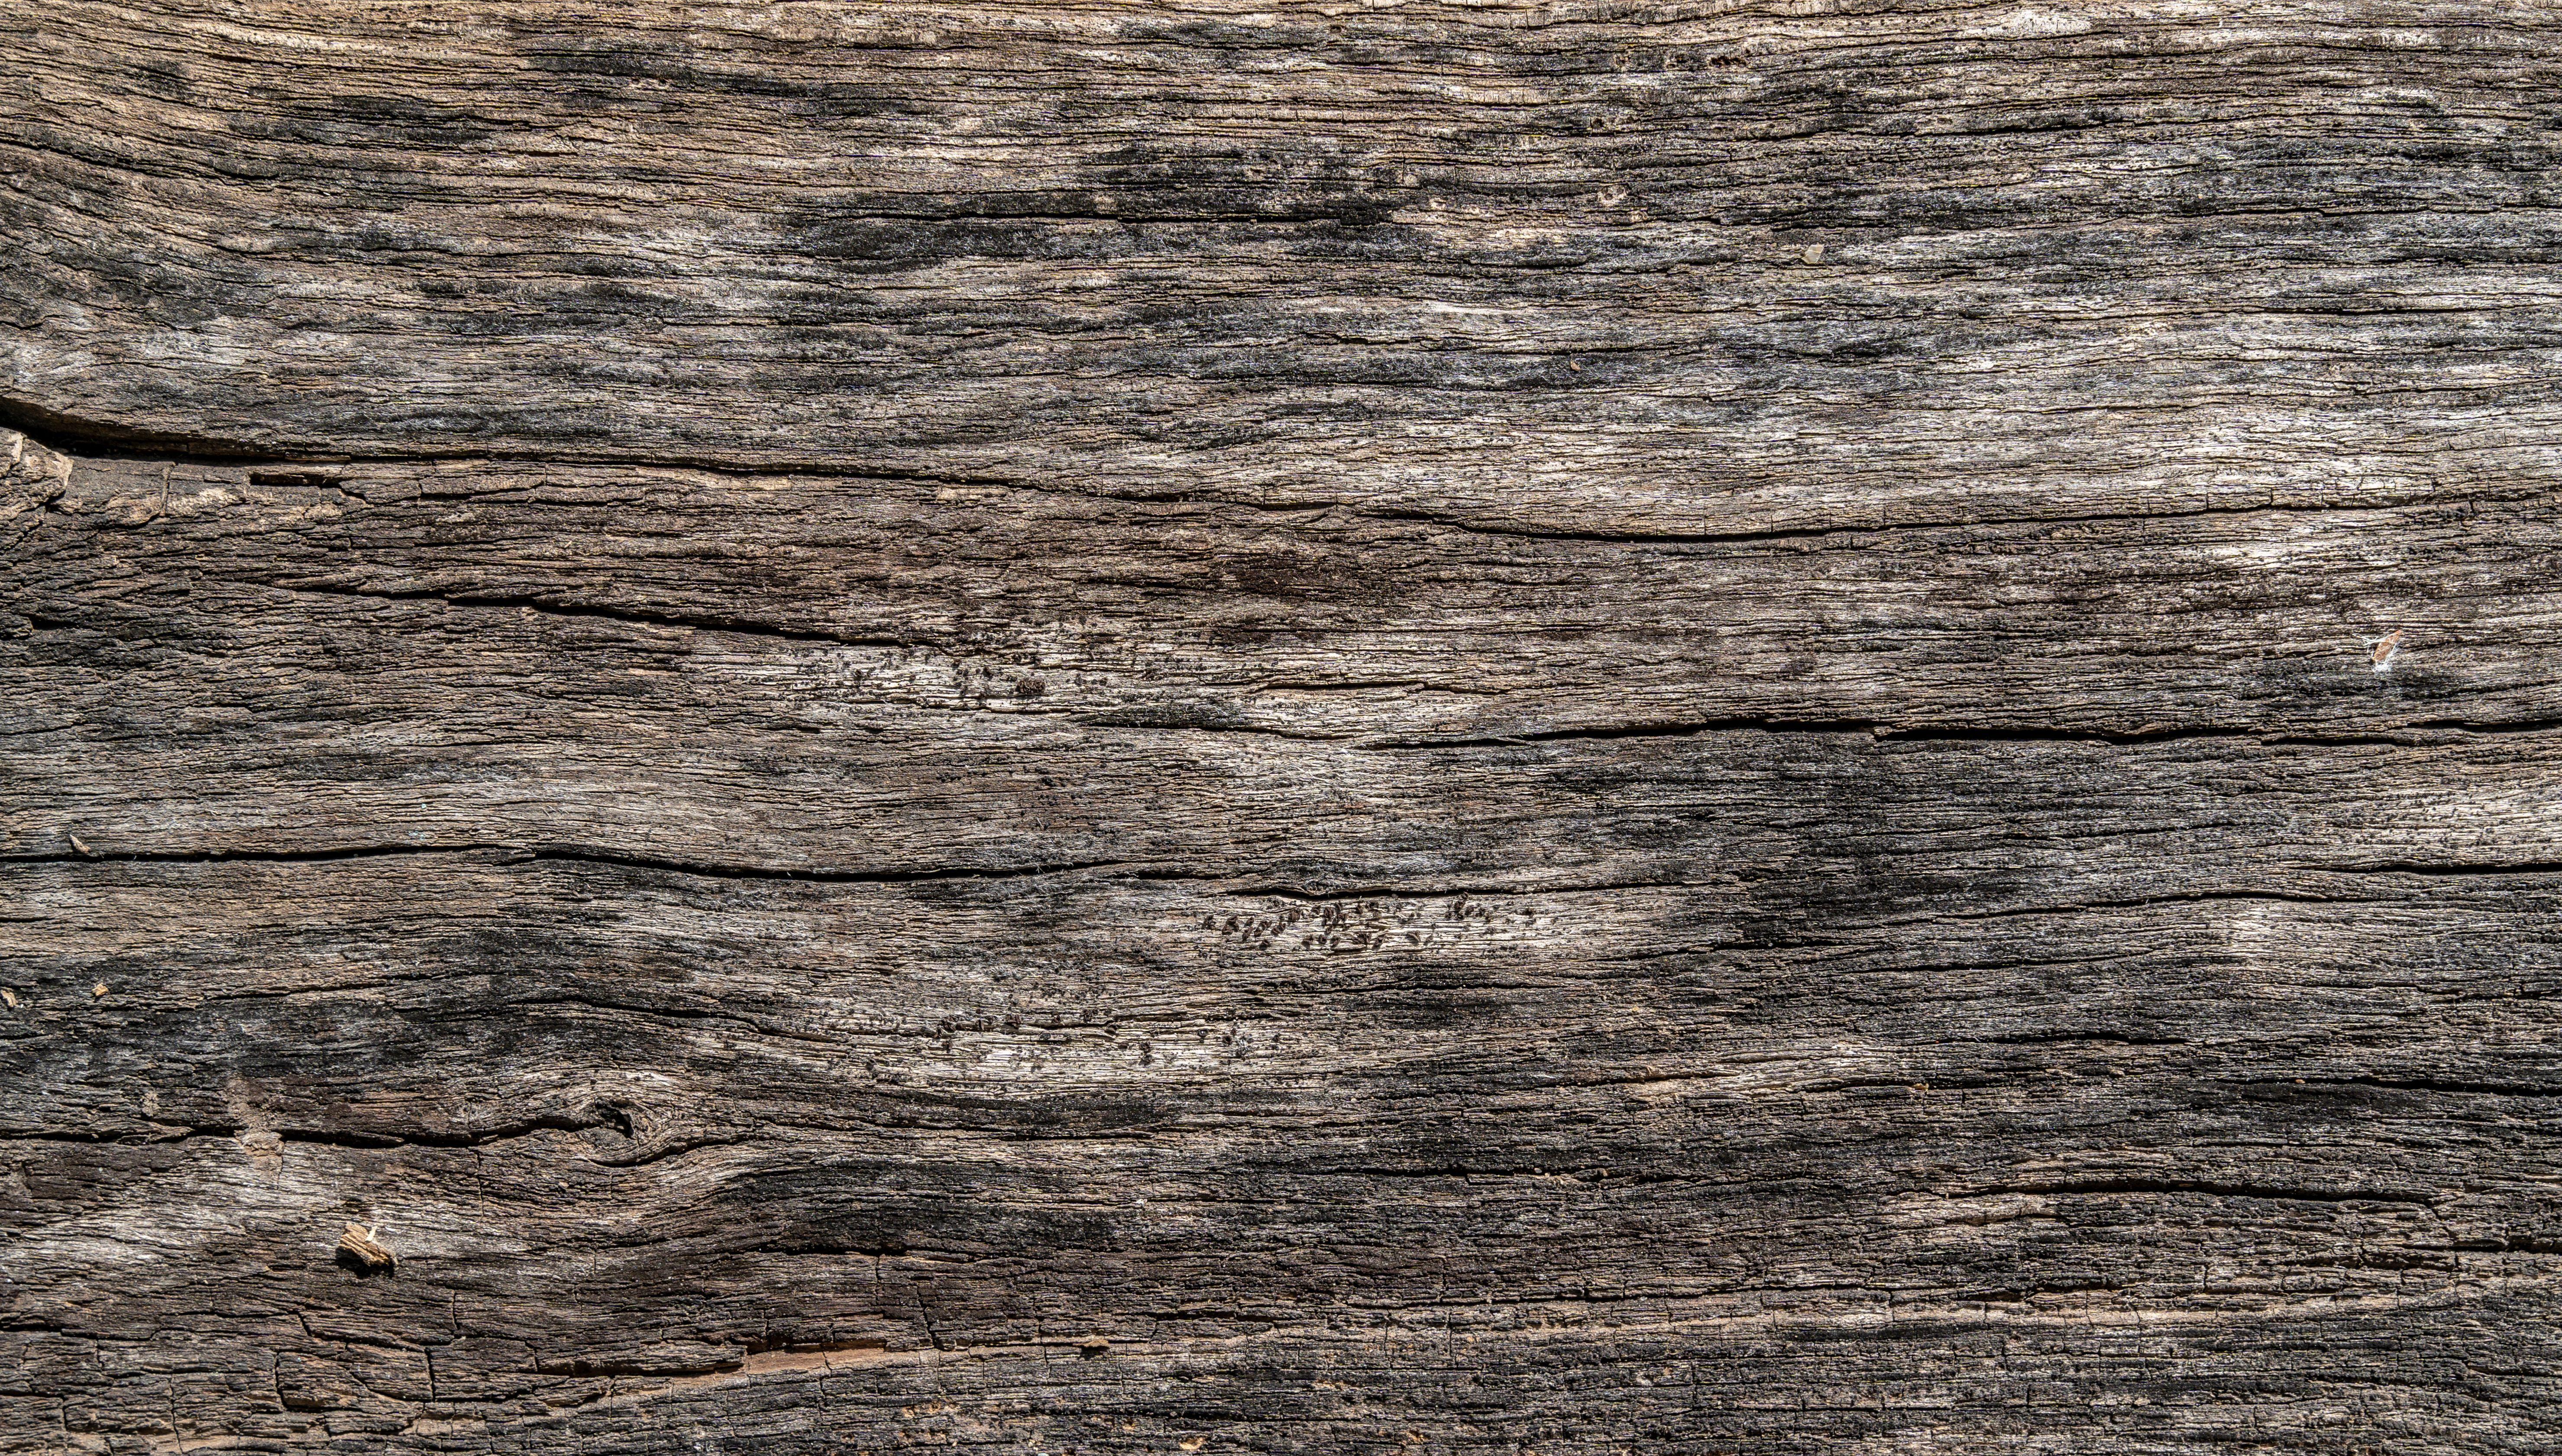 Wooden Texture Background Woodtexturebackground Wooden Texture Background Old Wood Texture With Scratche Wooden Textures Old Wood Texture Textured Background